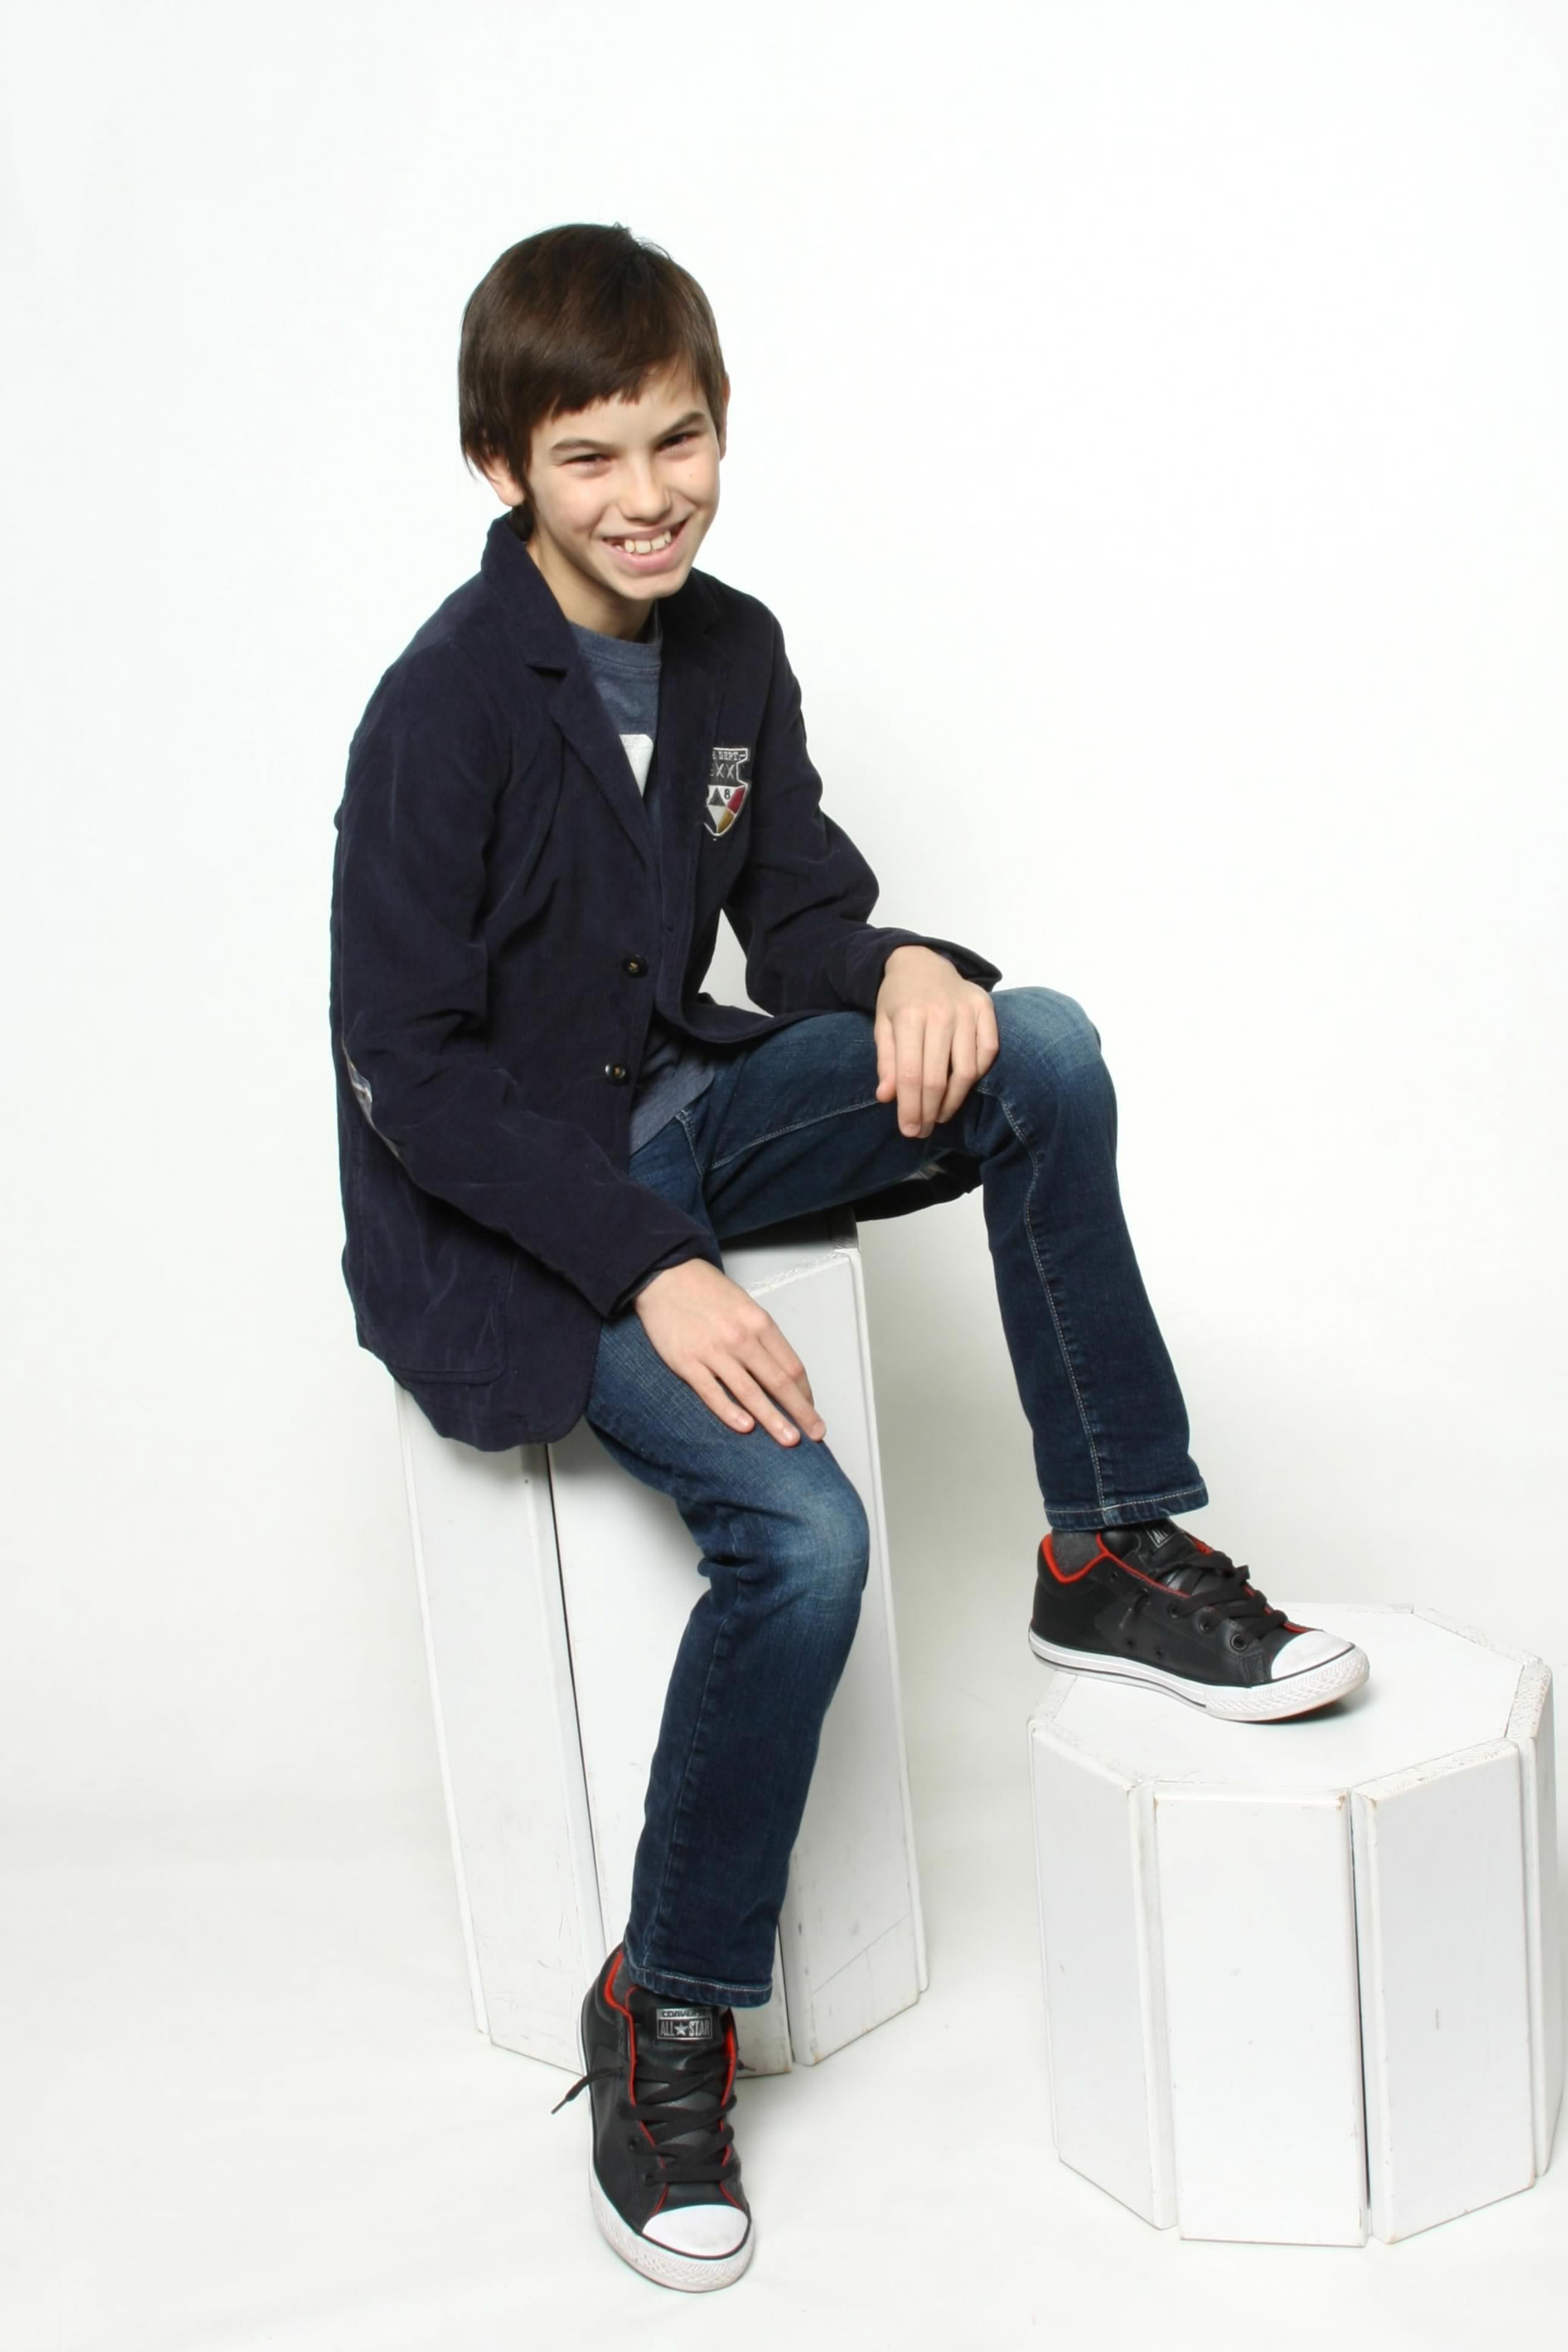 GABRIEL CORIVEAU SMILE